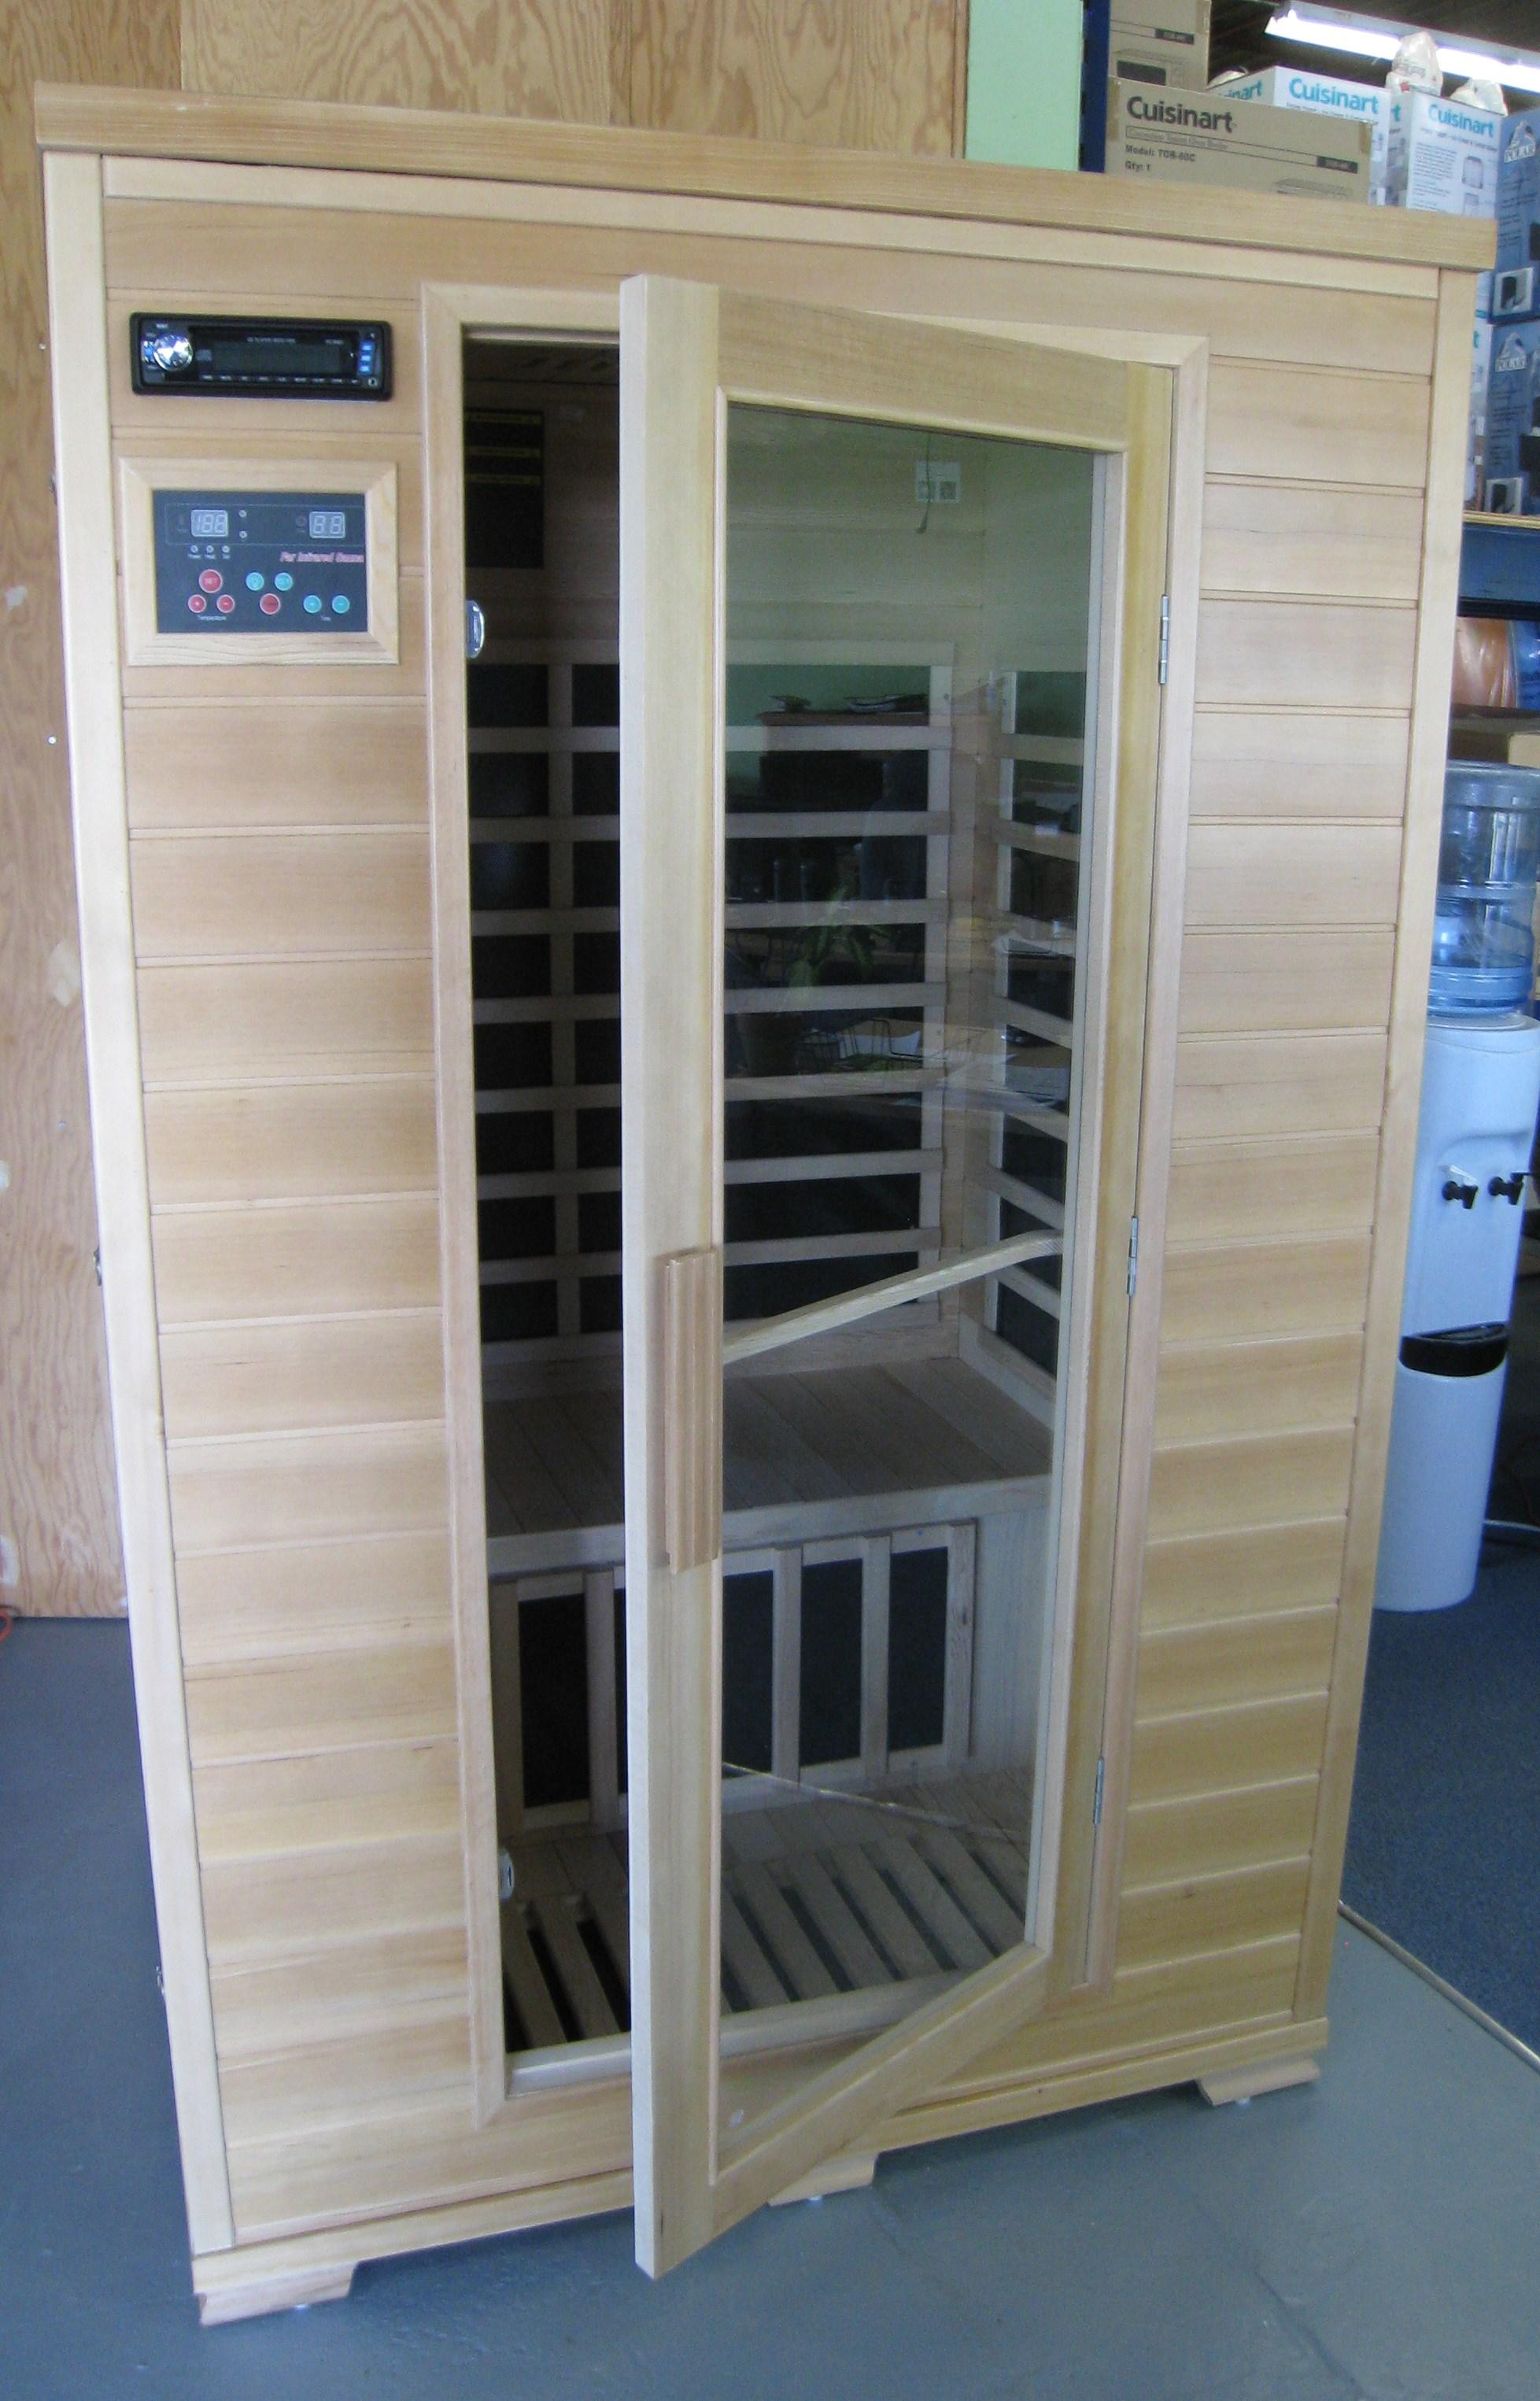 Saunas Far Infrared Hemlock Sauna Low EMF Carbon Fiber Heaters - 2 ...